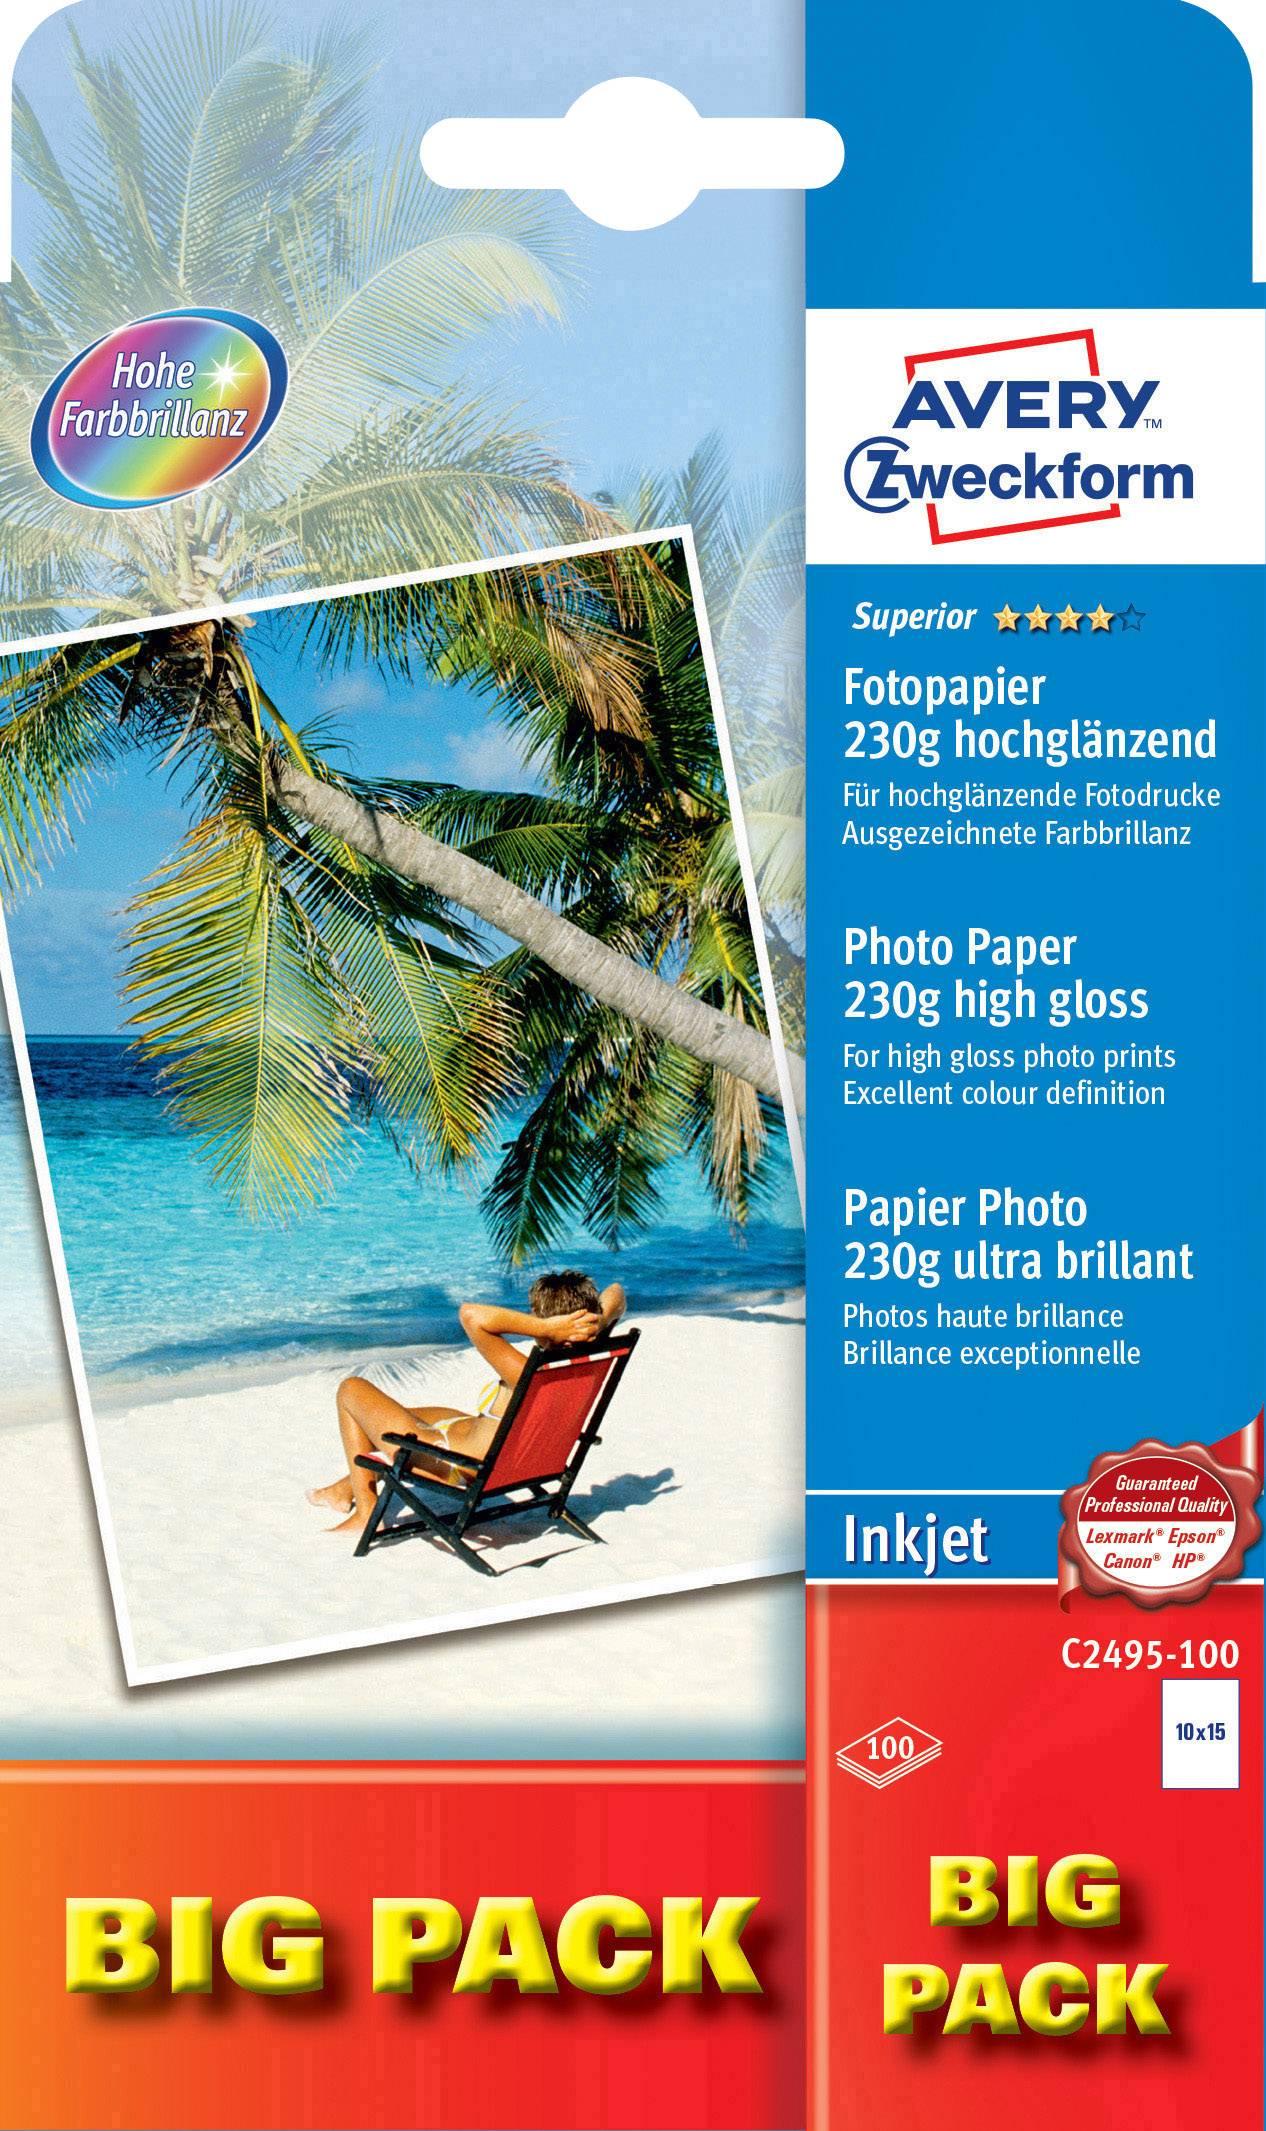 Fotografický papier Avery-Zweckform Superior Photo Paper Inkjet C2495-100, 10 x 15 cm, 230 gm², 100 listov